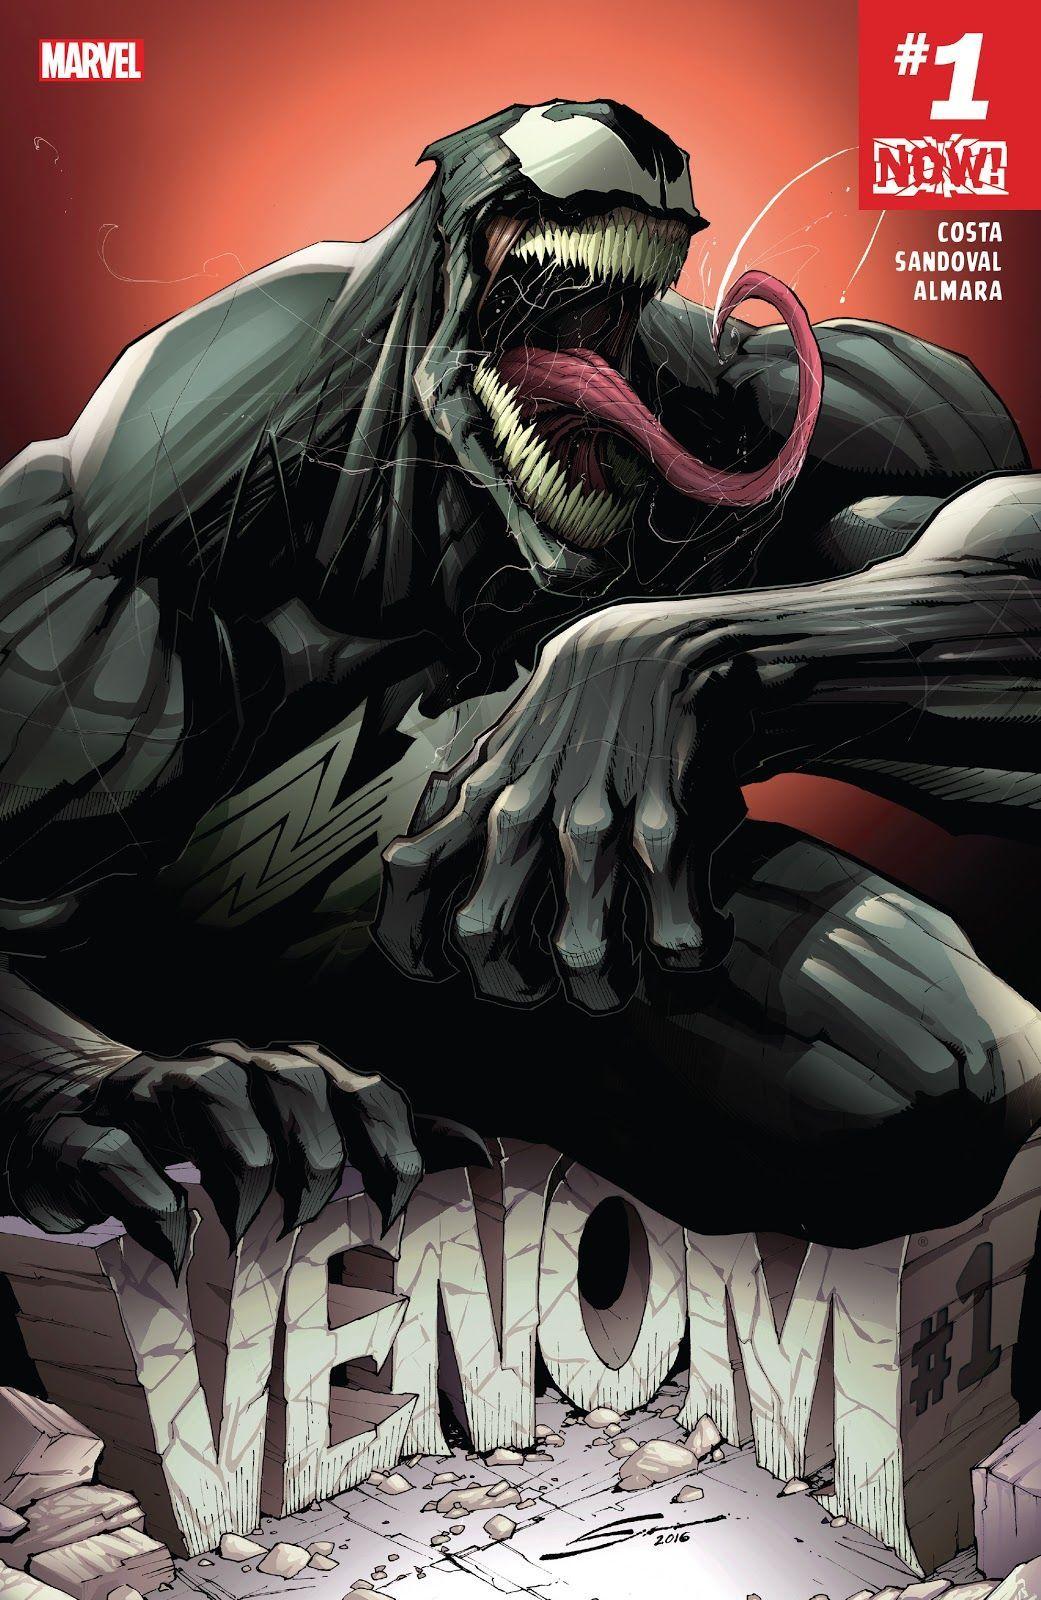 Venom #1 2016 (Writer Mike Costa, Artist Gerardo Sondoval)